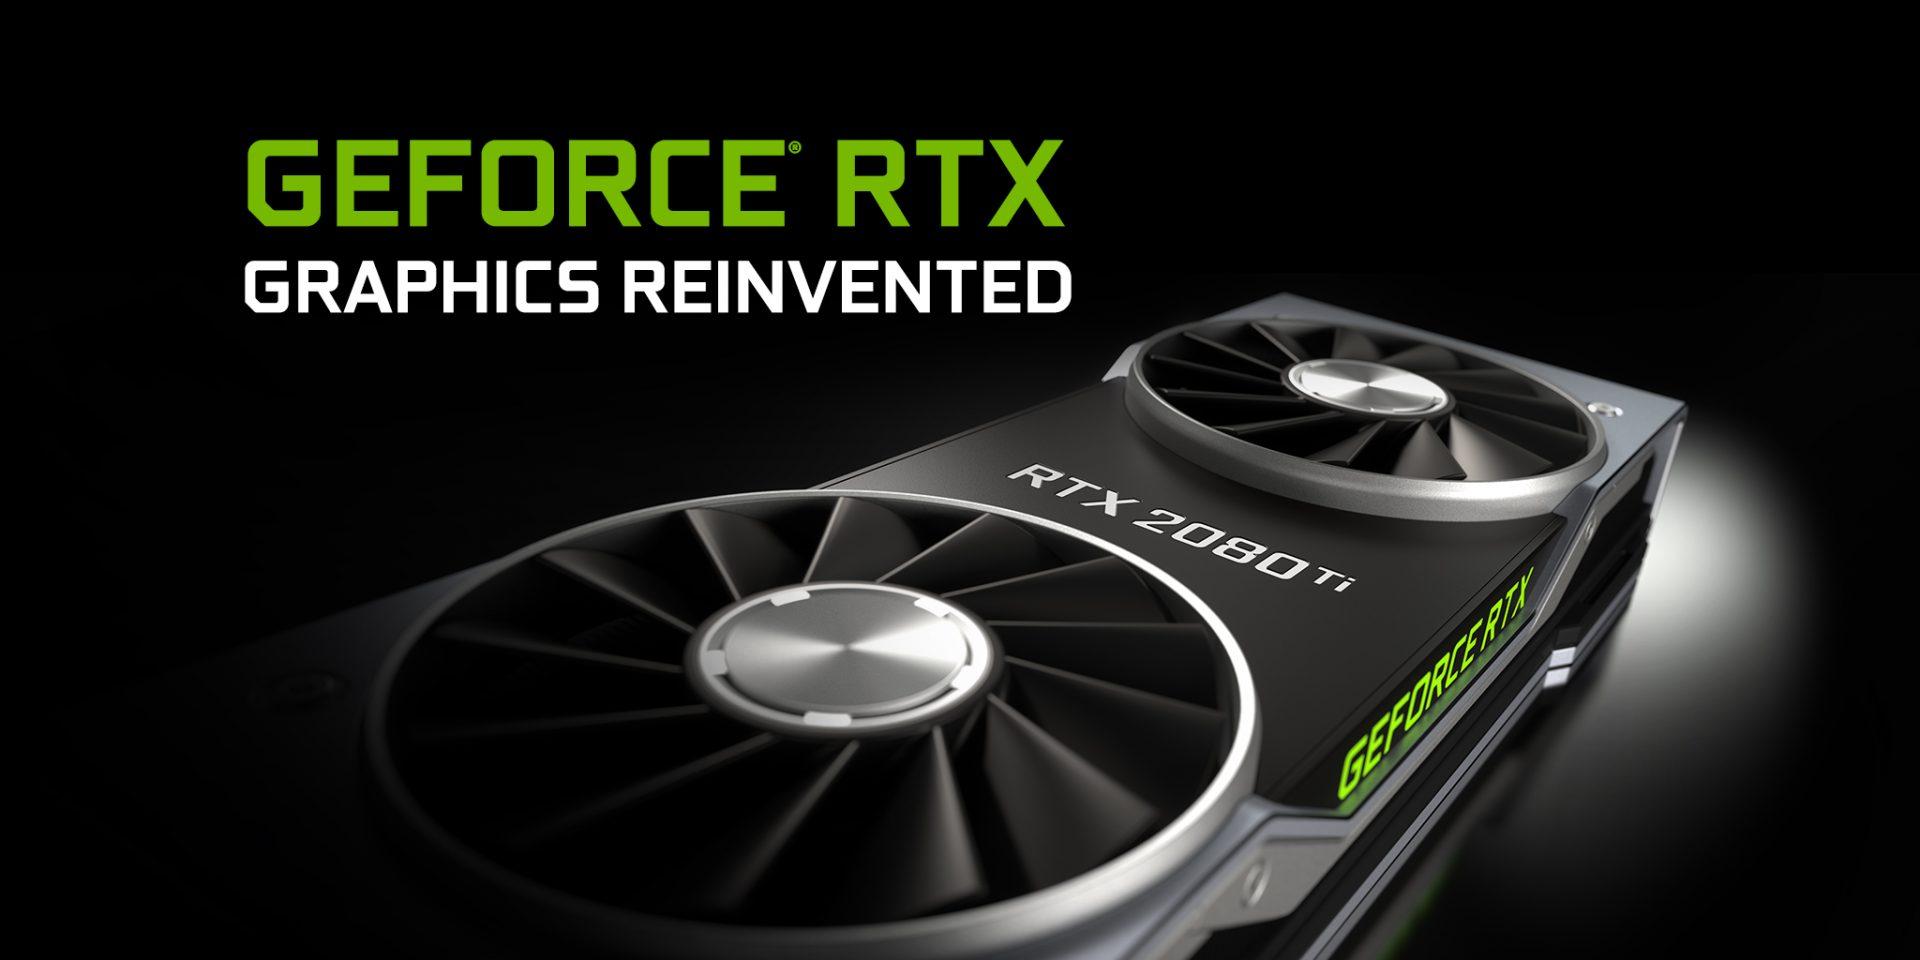 Alienware Installs NVIDIA's GeForce RTX Cards In Aurora and Area-51 Desktops